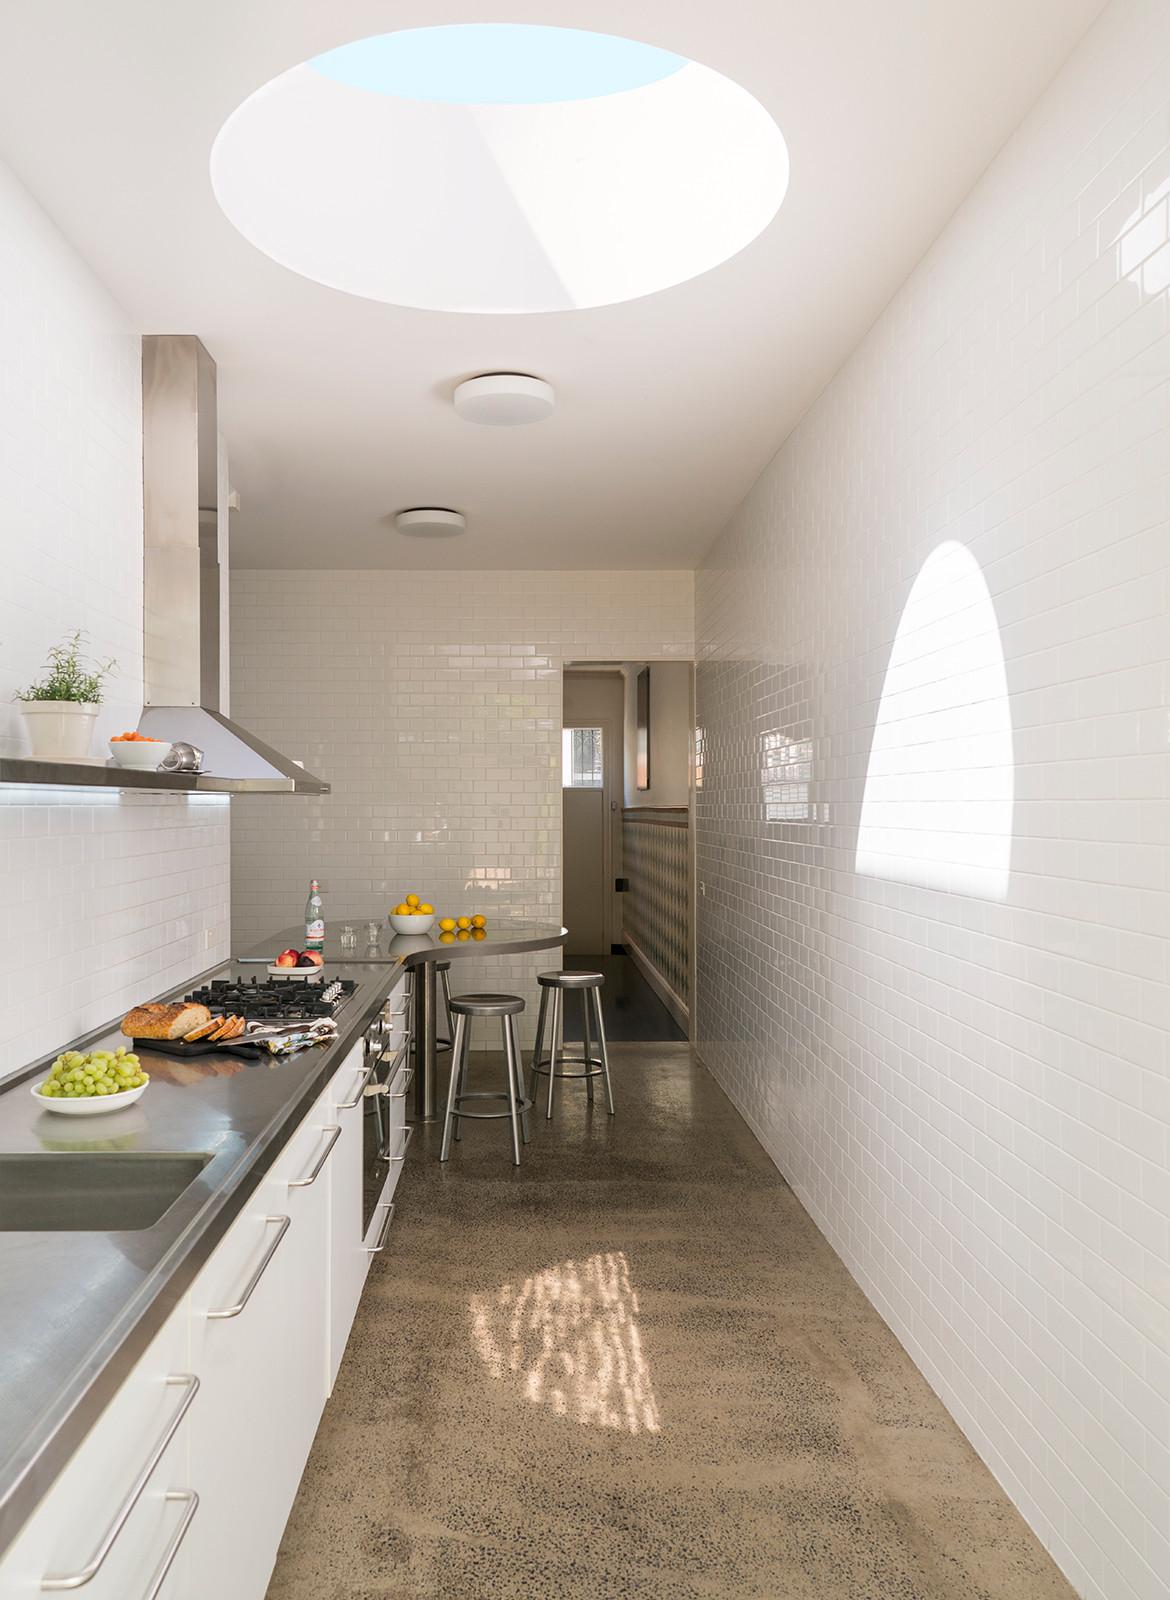 Hastings Van Nunen Ian Moore Architects CC Daniel Mayne kitchen